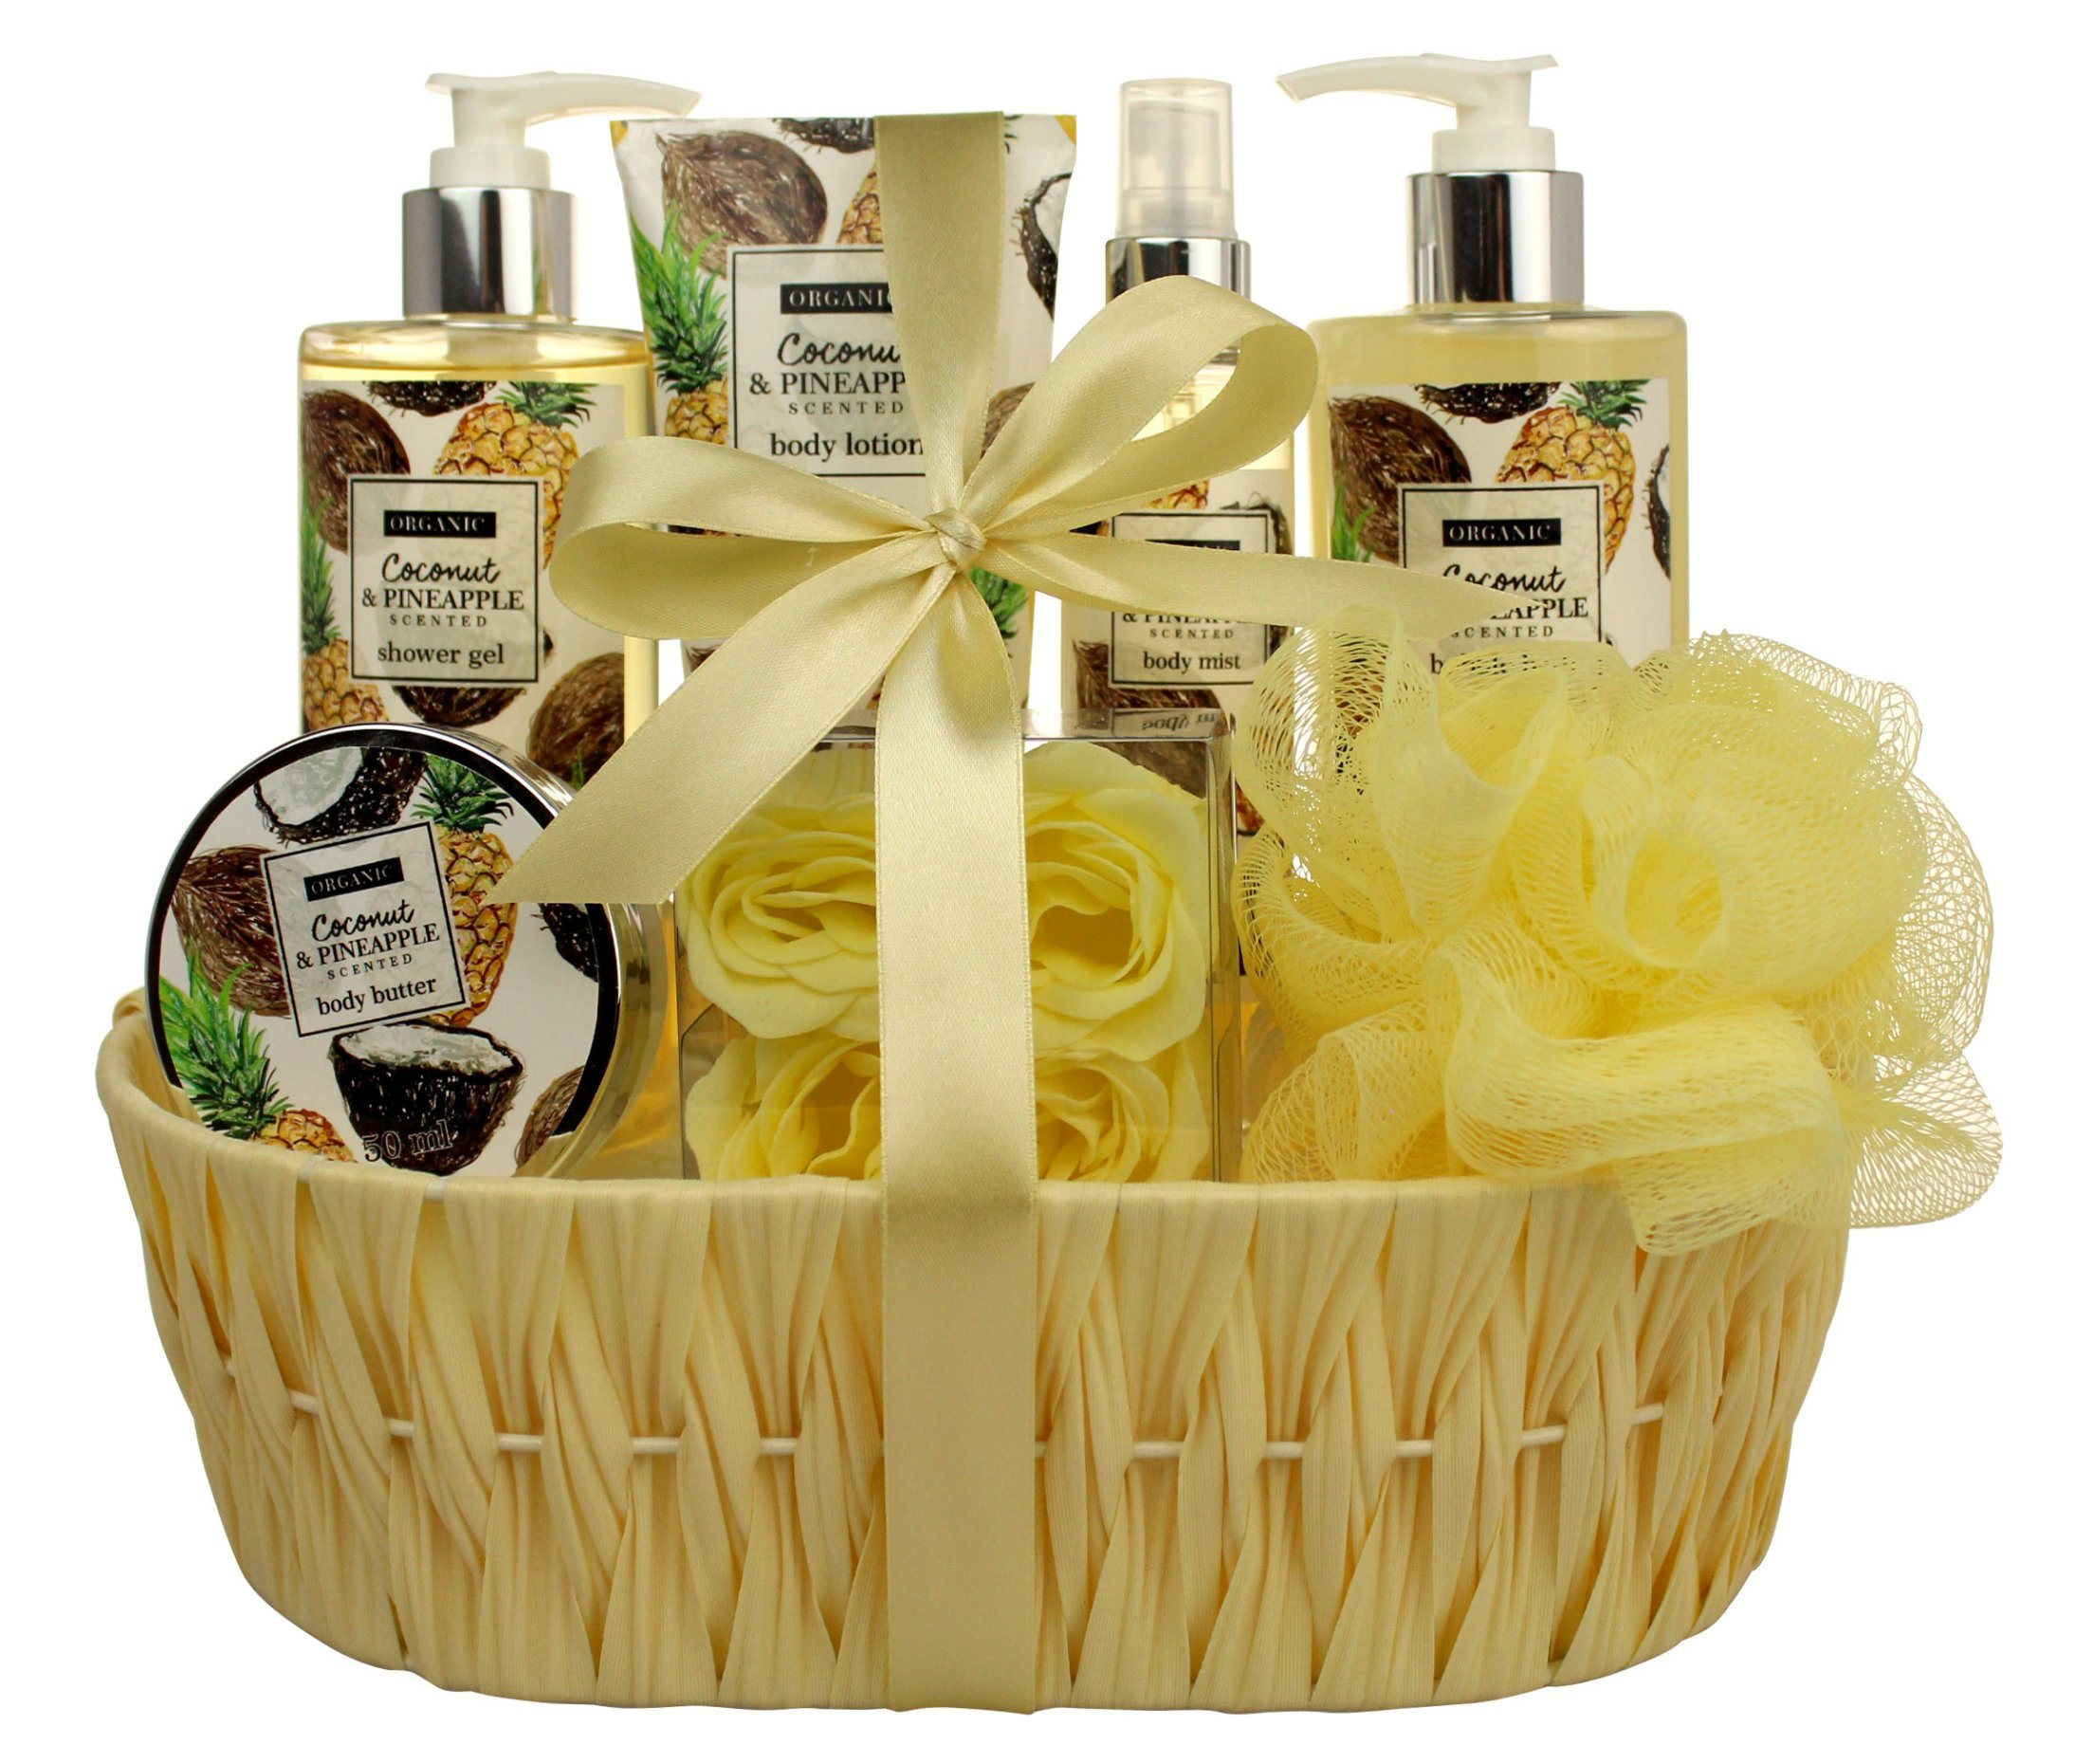 China Wholesale Beauty Natural Purple Packaging Bath Spa Gift Set China Spa Bath Set And Bath Spa Set Price